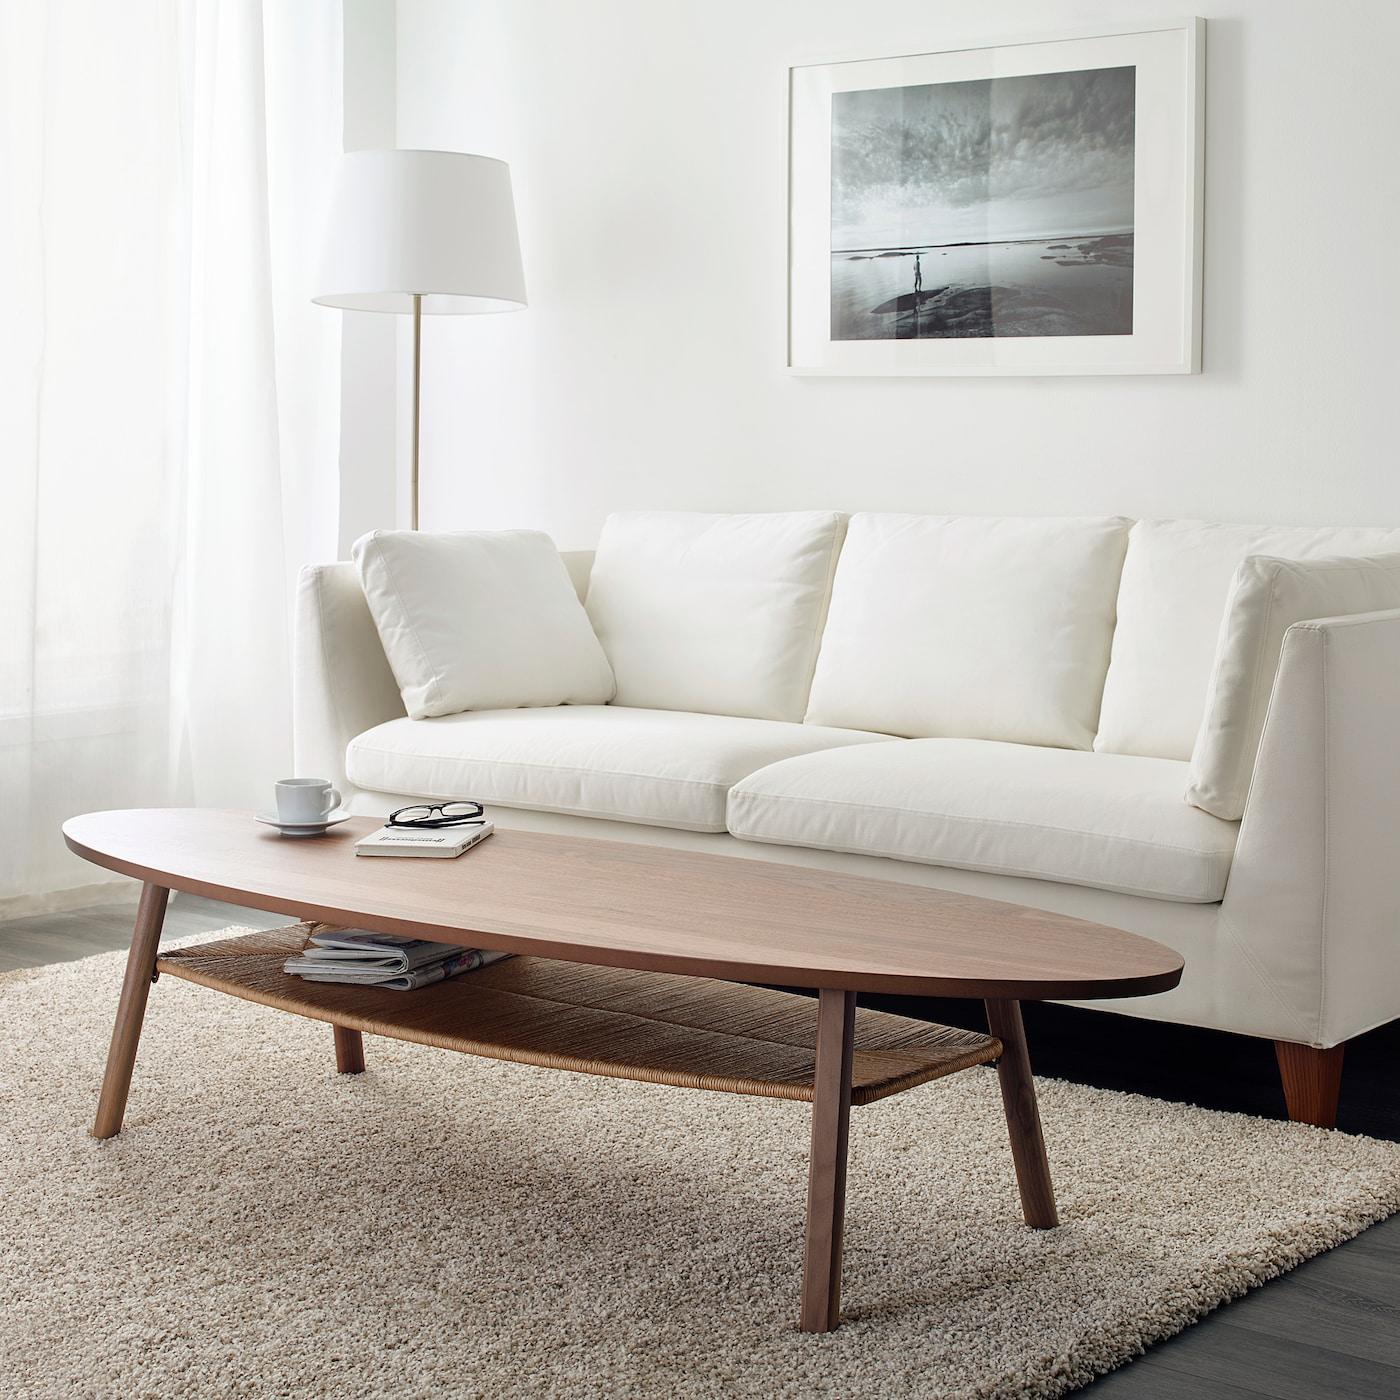 Stockholm Coffee Table Walnut Veneer 707 8x231 4 180x59 Cm Ikea [ 1400 x 1400 Pixel ]